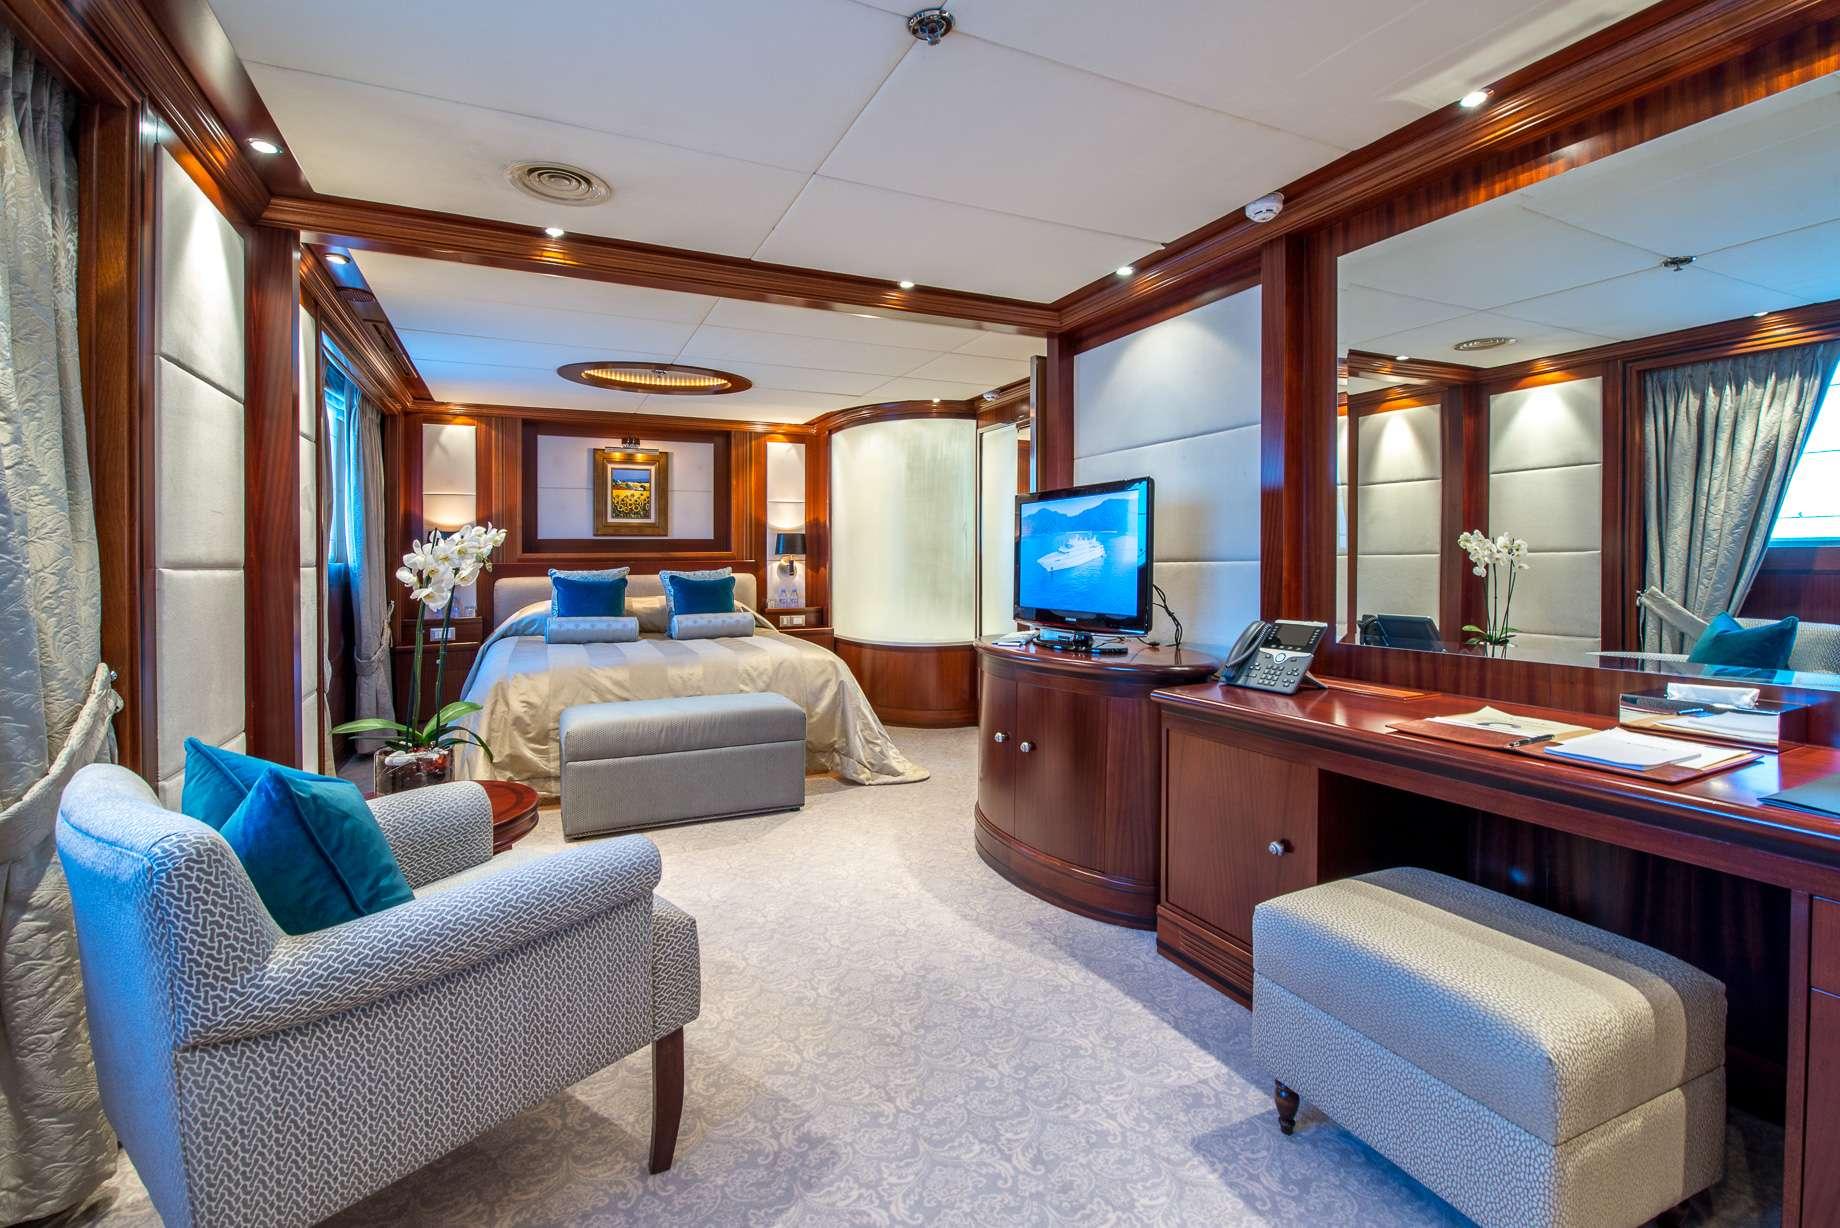 Motor Yacht 'LAUREN L' VIP Cabin, 40 PAX, 295.00 Ft, 90.00 Meters, Built 2002, Cassens Werft, Refit Year 2008/2015